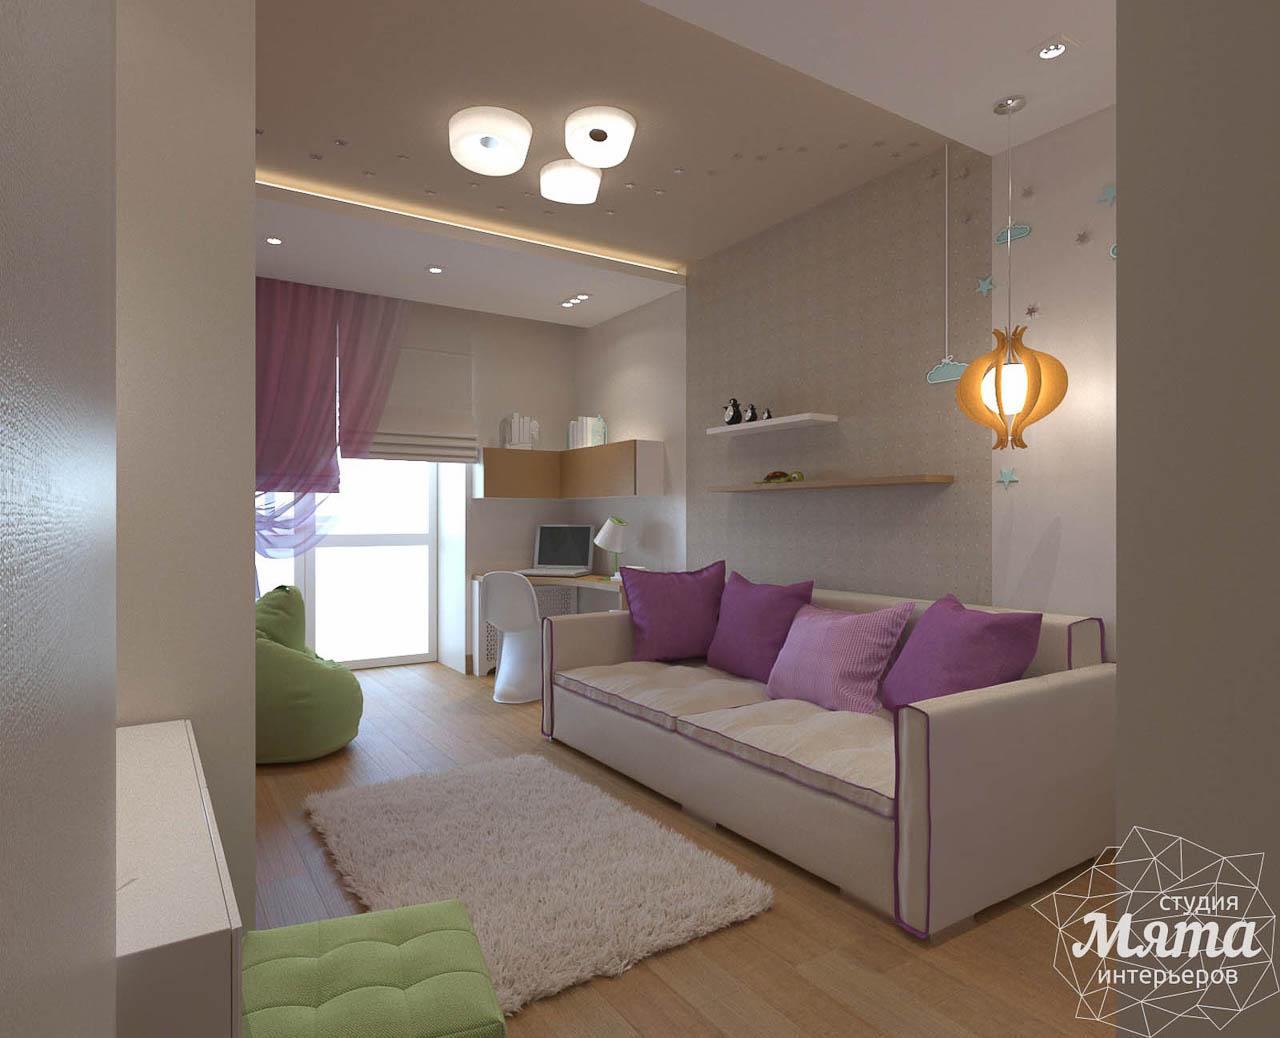 Дизайн интерьера трехкомнатной квартиры по ул. Мельникова 27 img1396897022